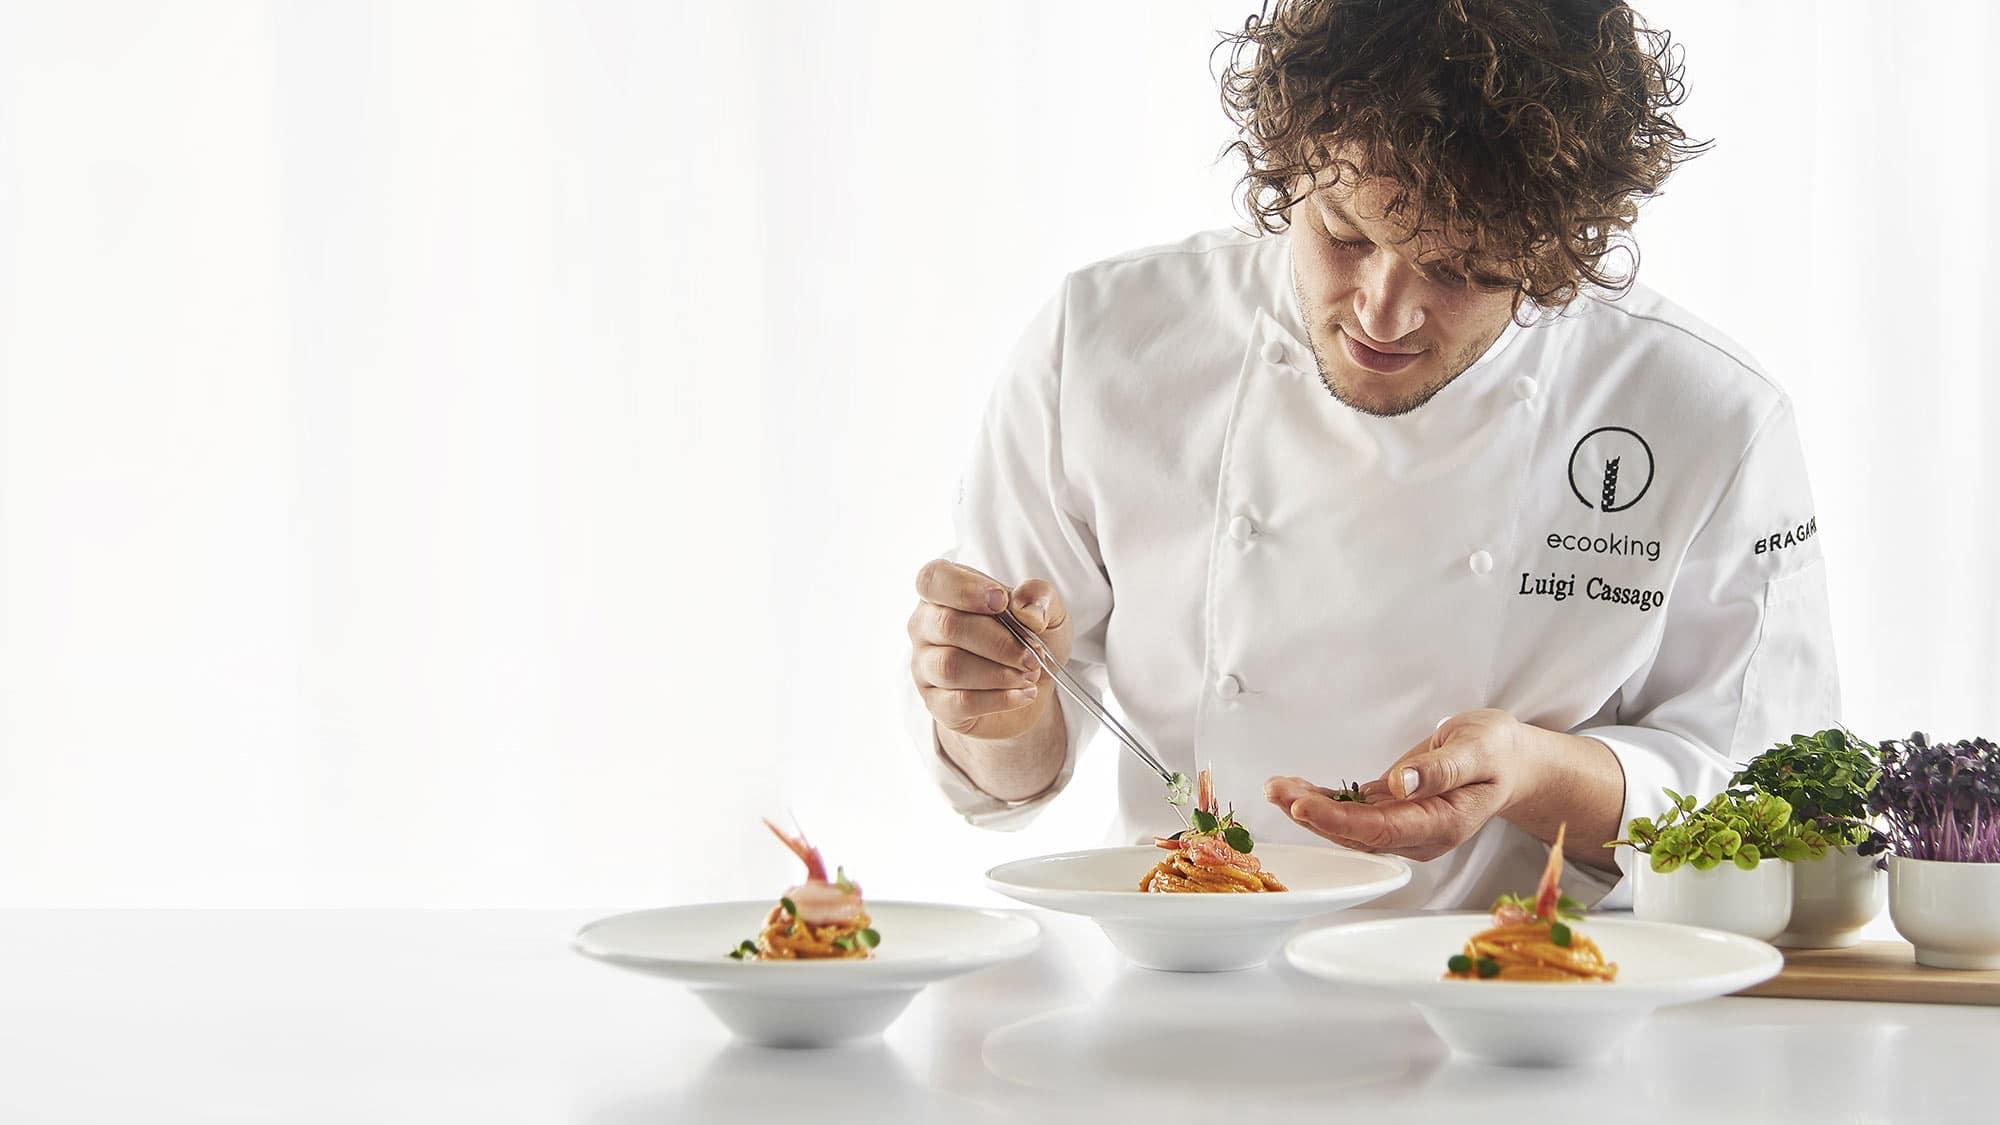 Ecooking Pasta Piatti Food Shot by Fotografando